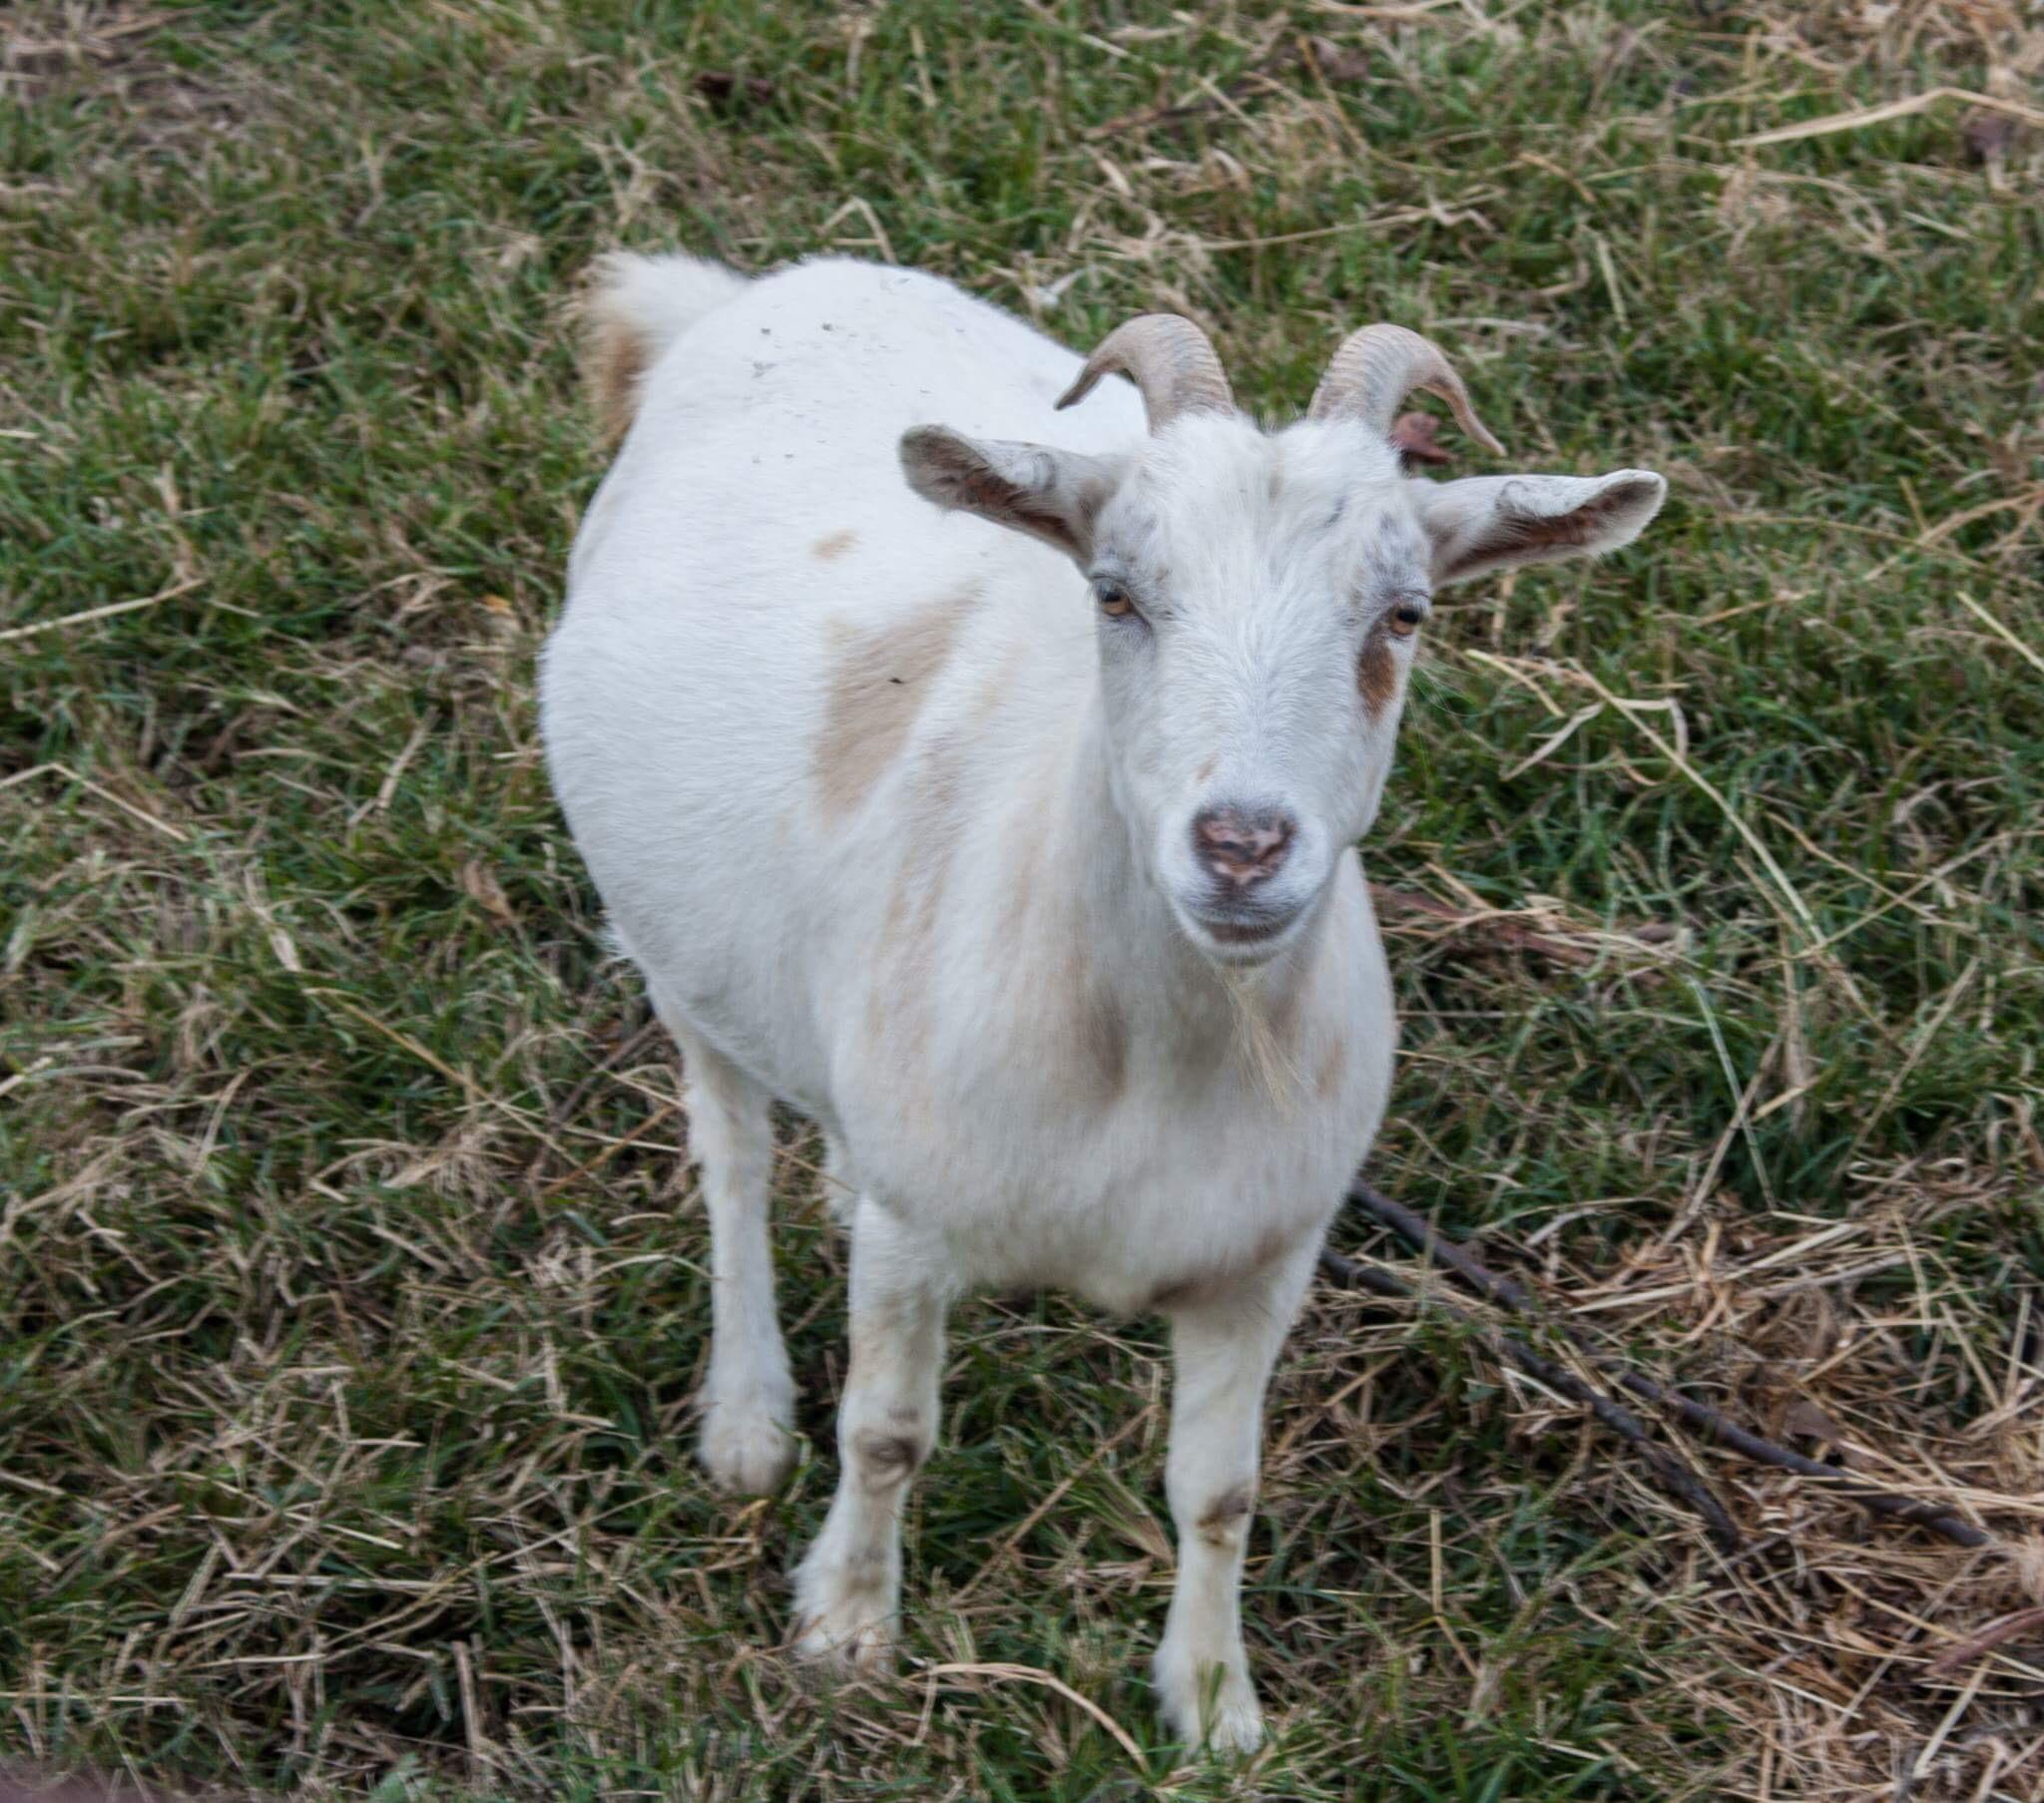 Goat by Mercedes Tortat